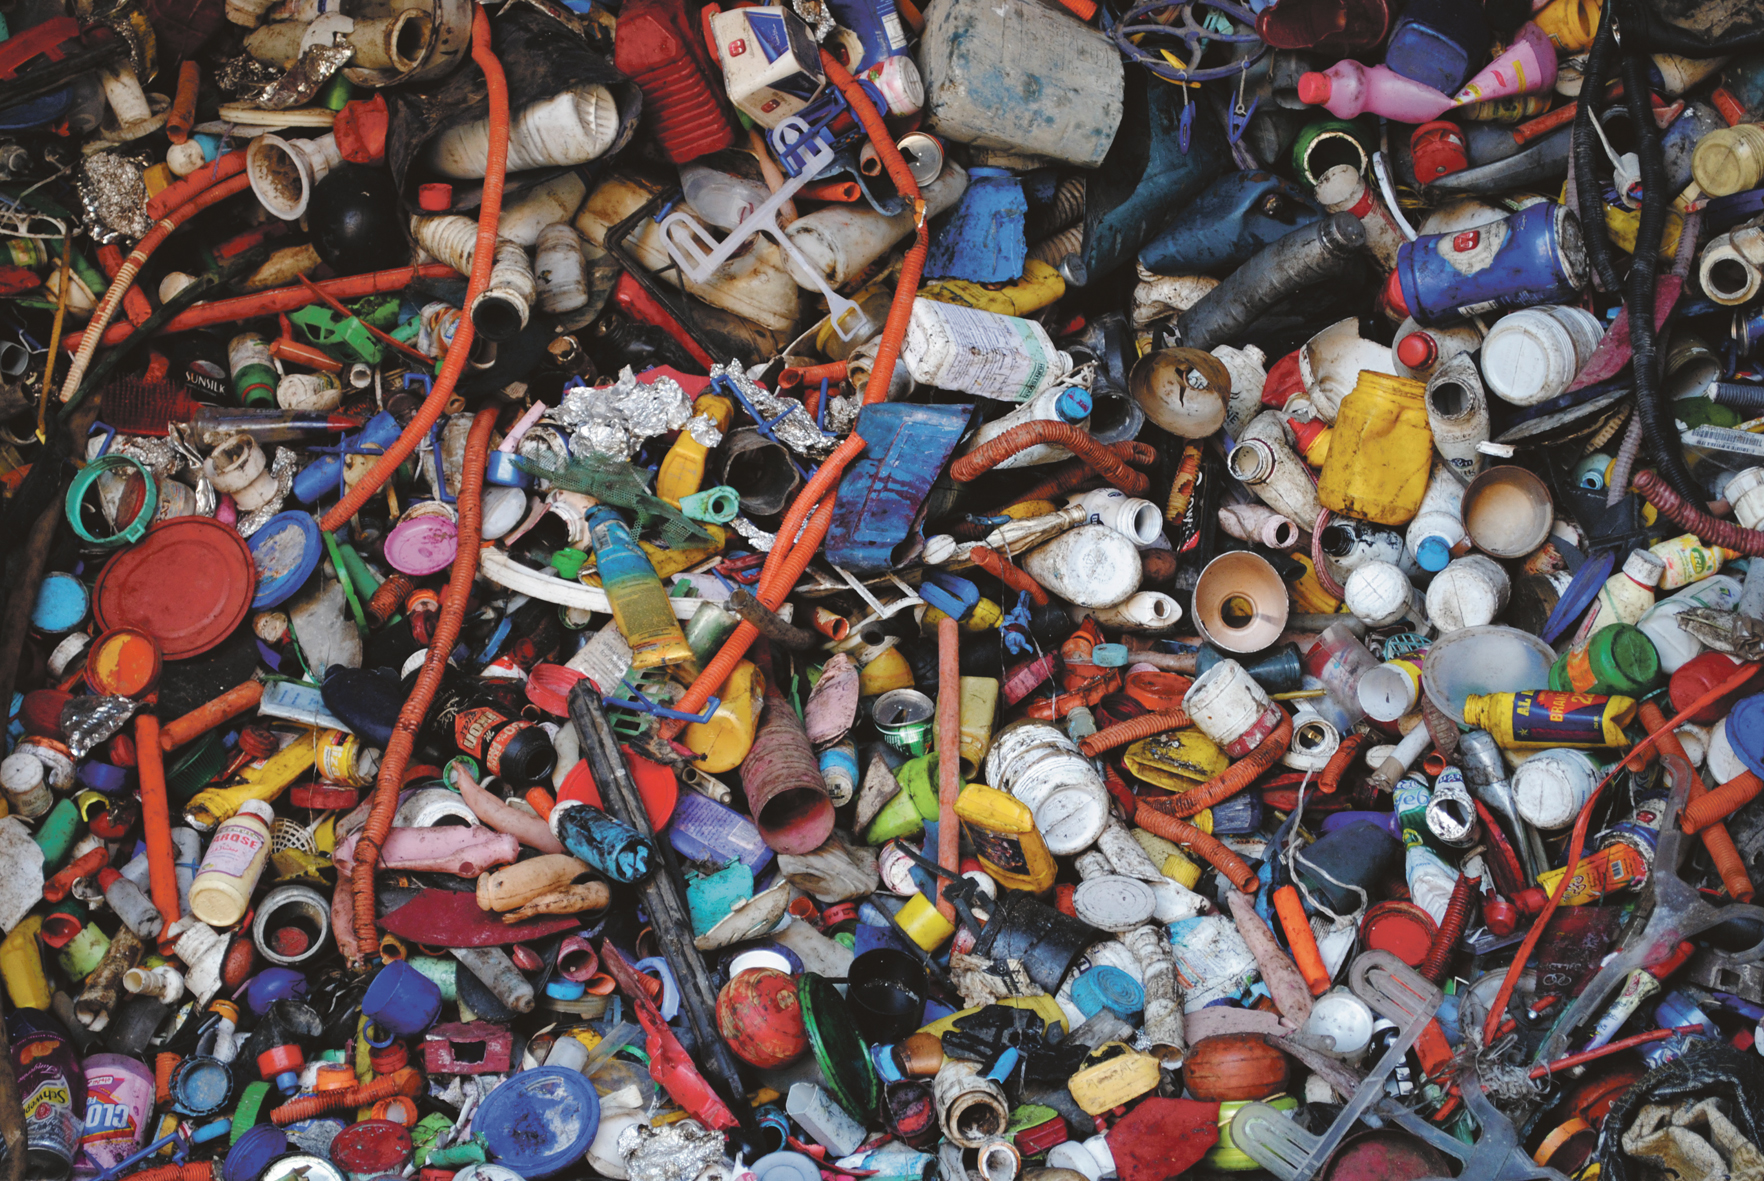 Waste Collection, utställning Upplandsmuseet 4 februari - 1 maj 2011